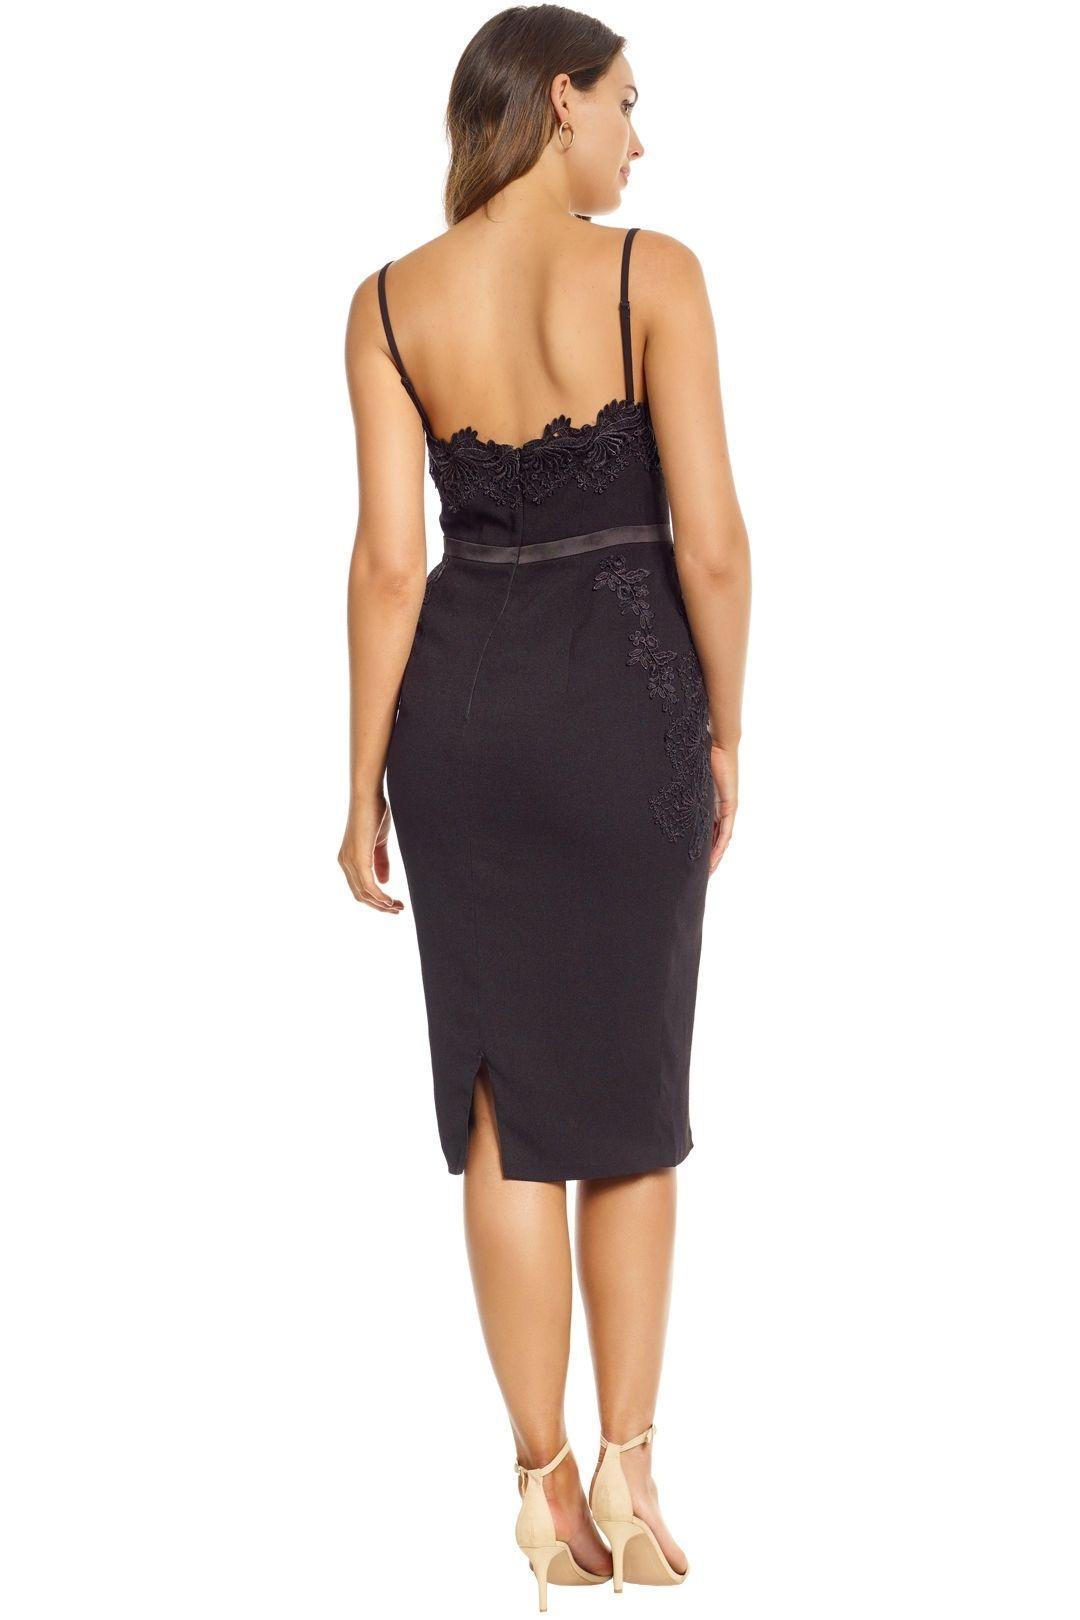 Elle Zeitoune - Black Madeline Dress - Black - Back